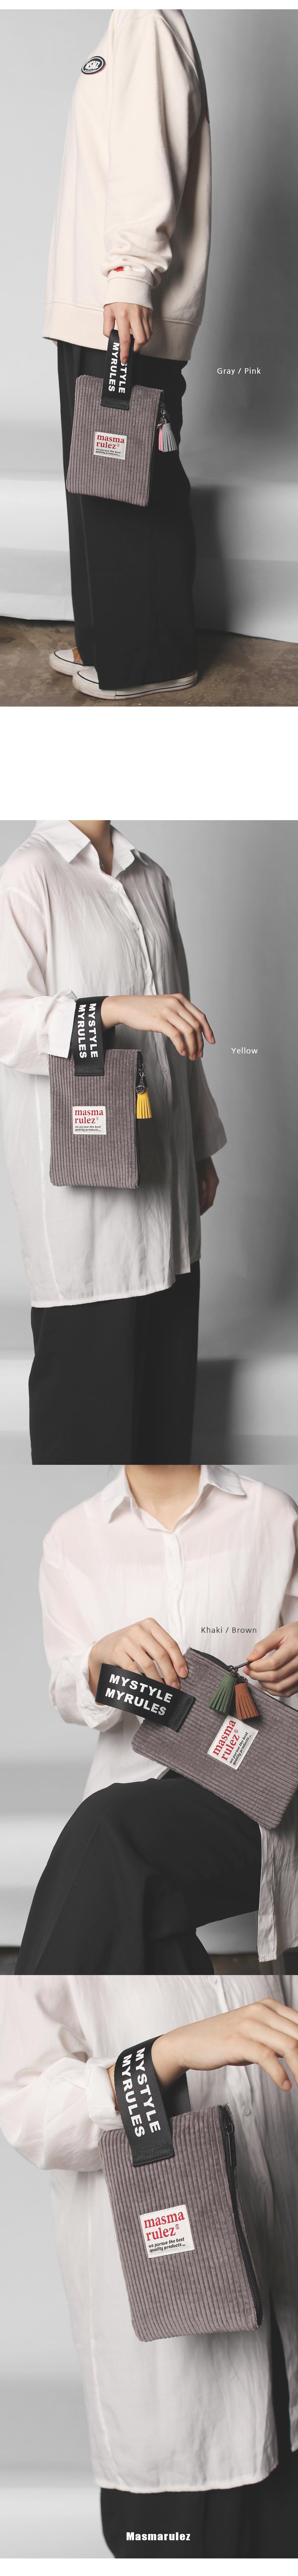 corduroy-gray-d-3.jpg